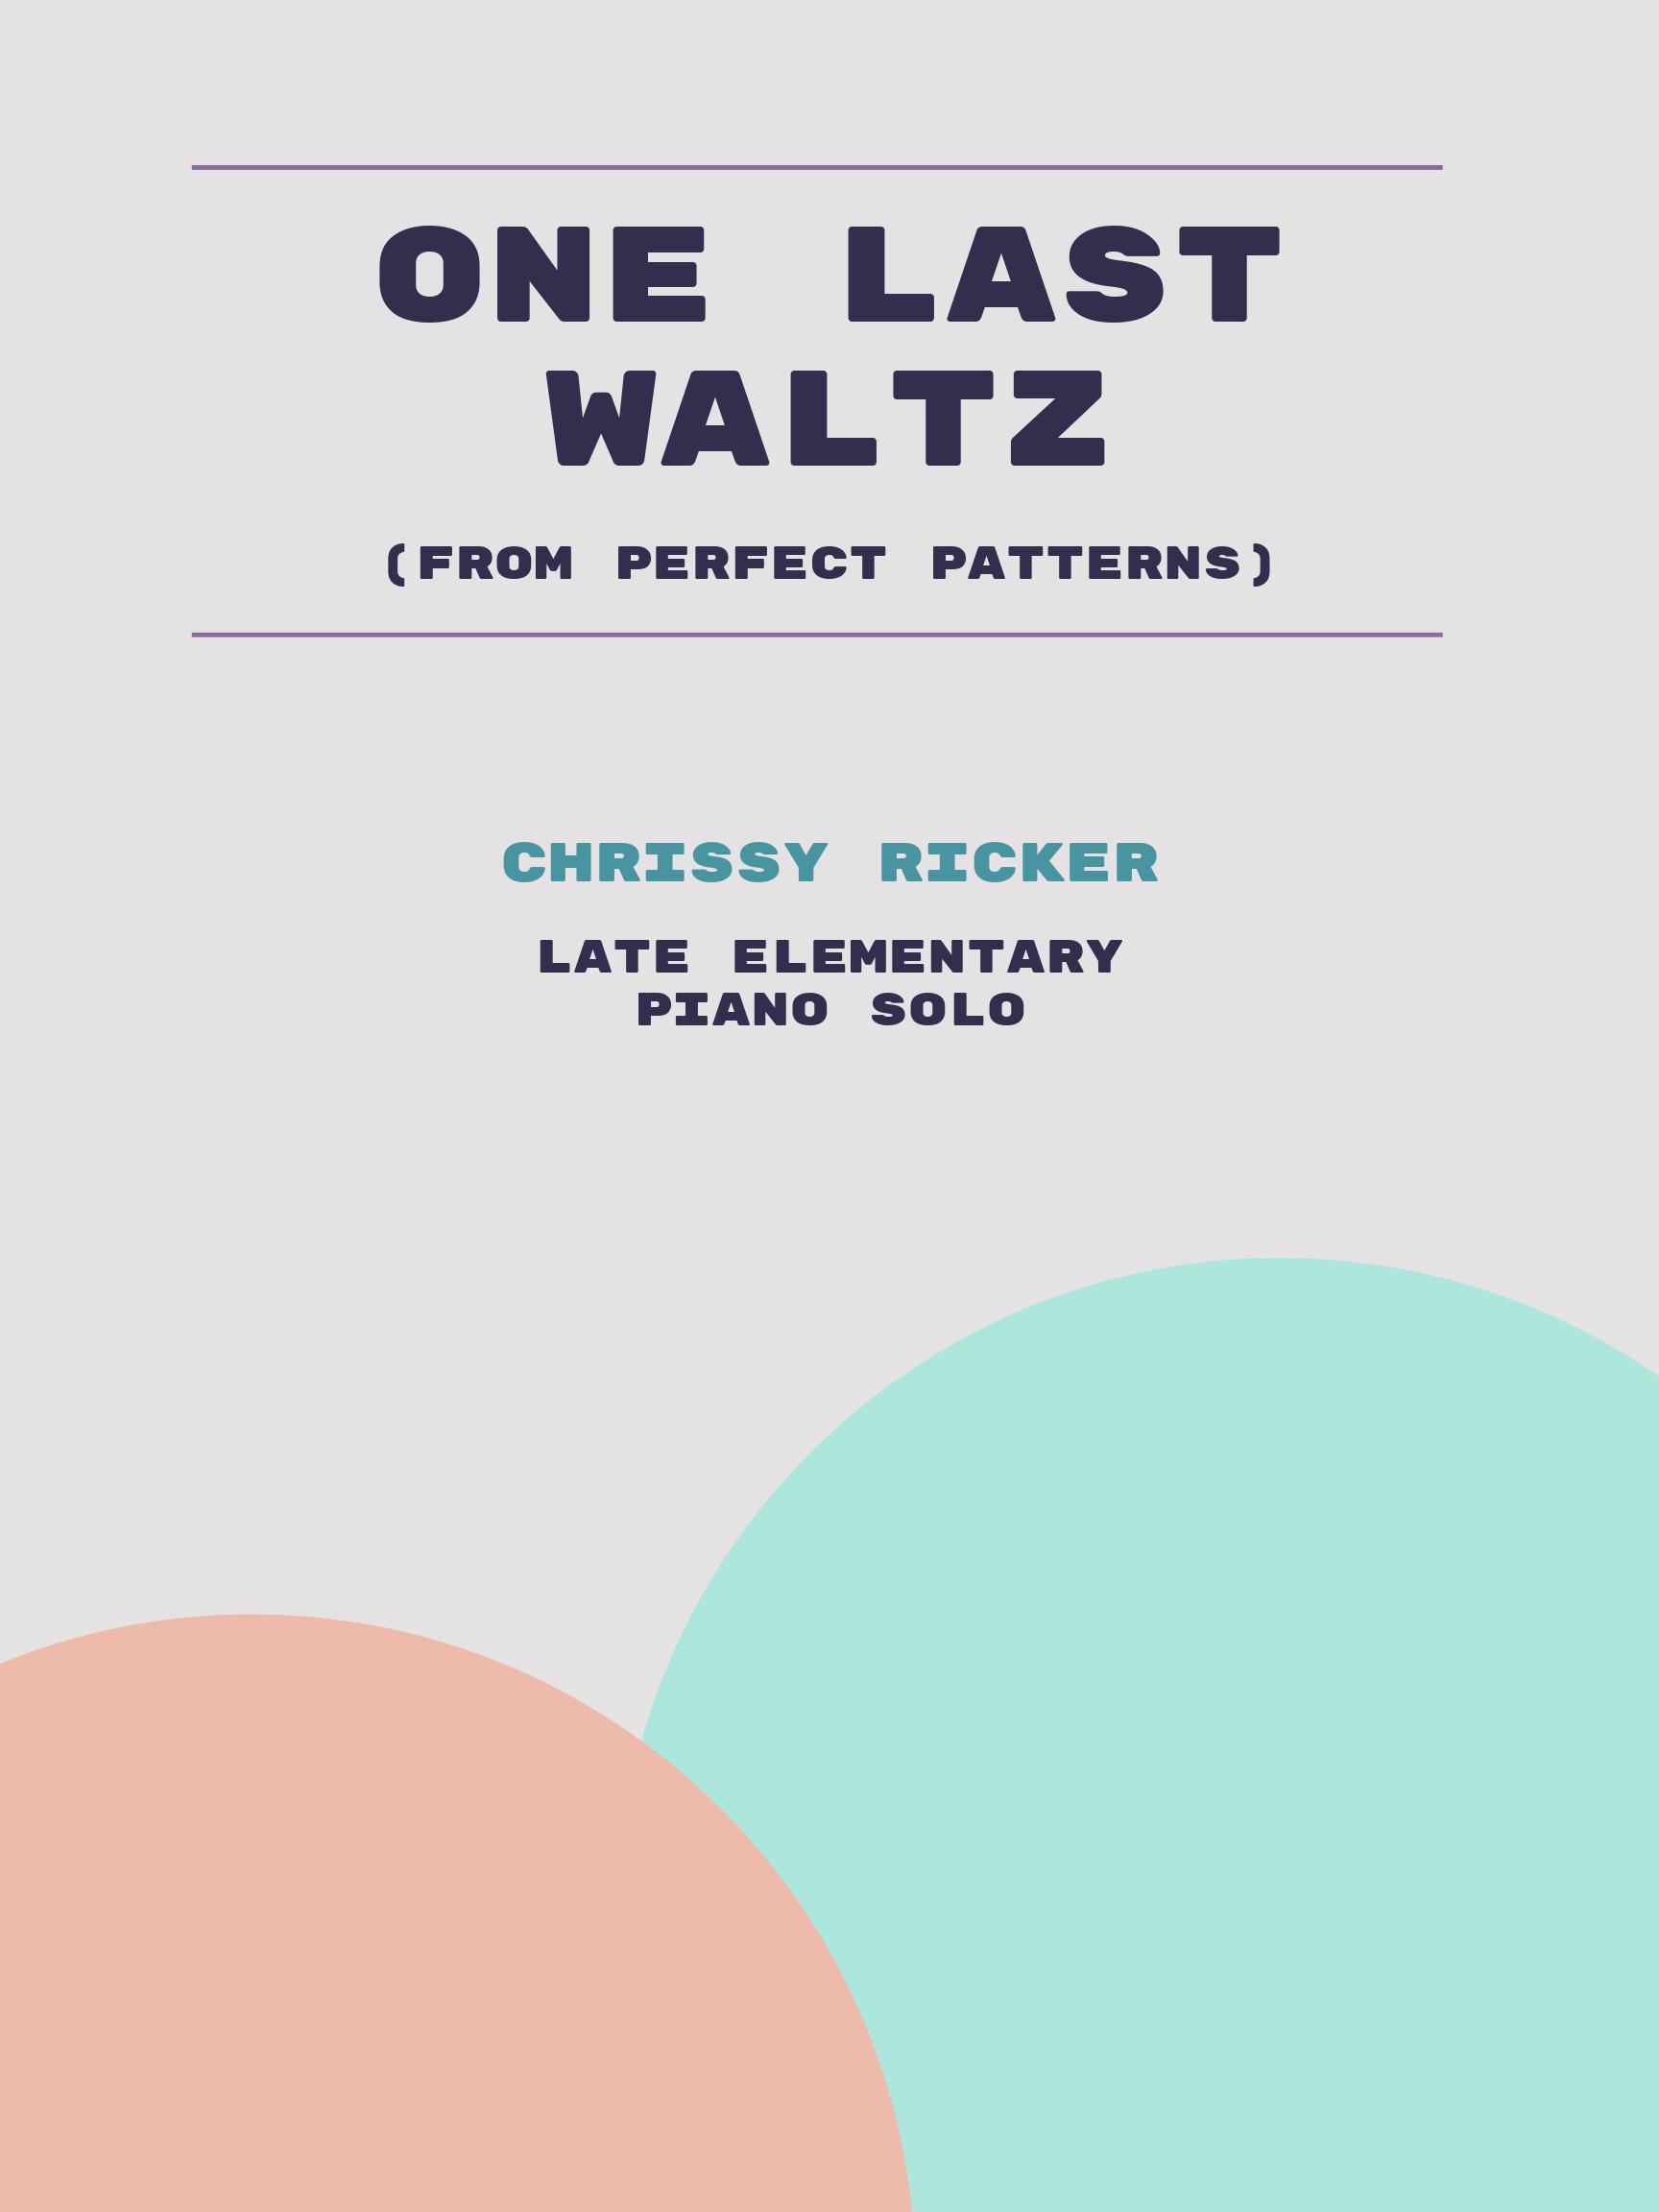 One Last Waltz by Chrissy Ricker